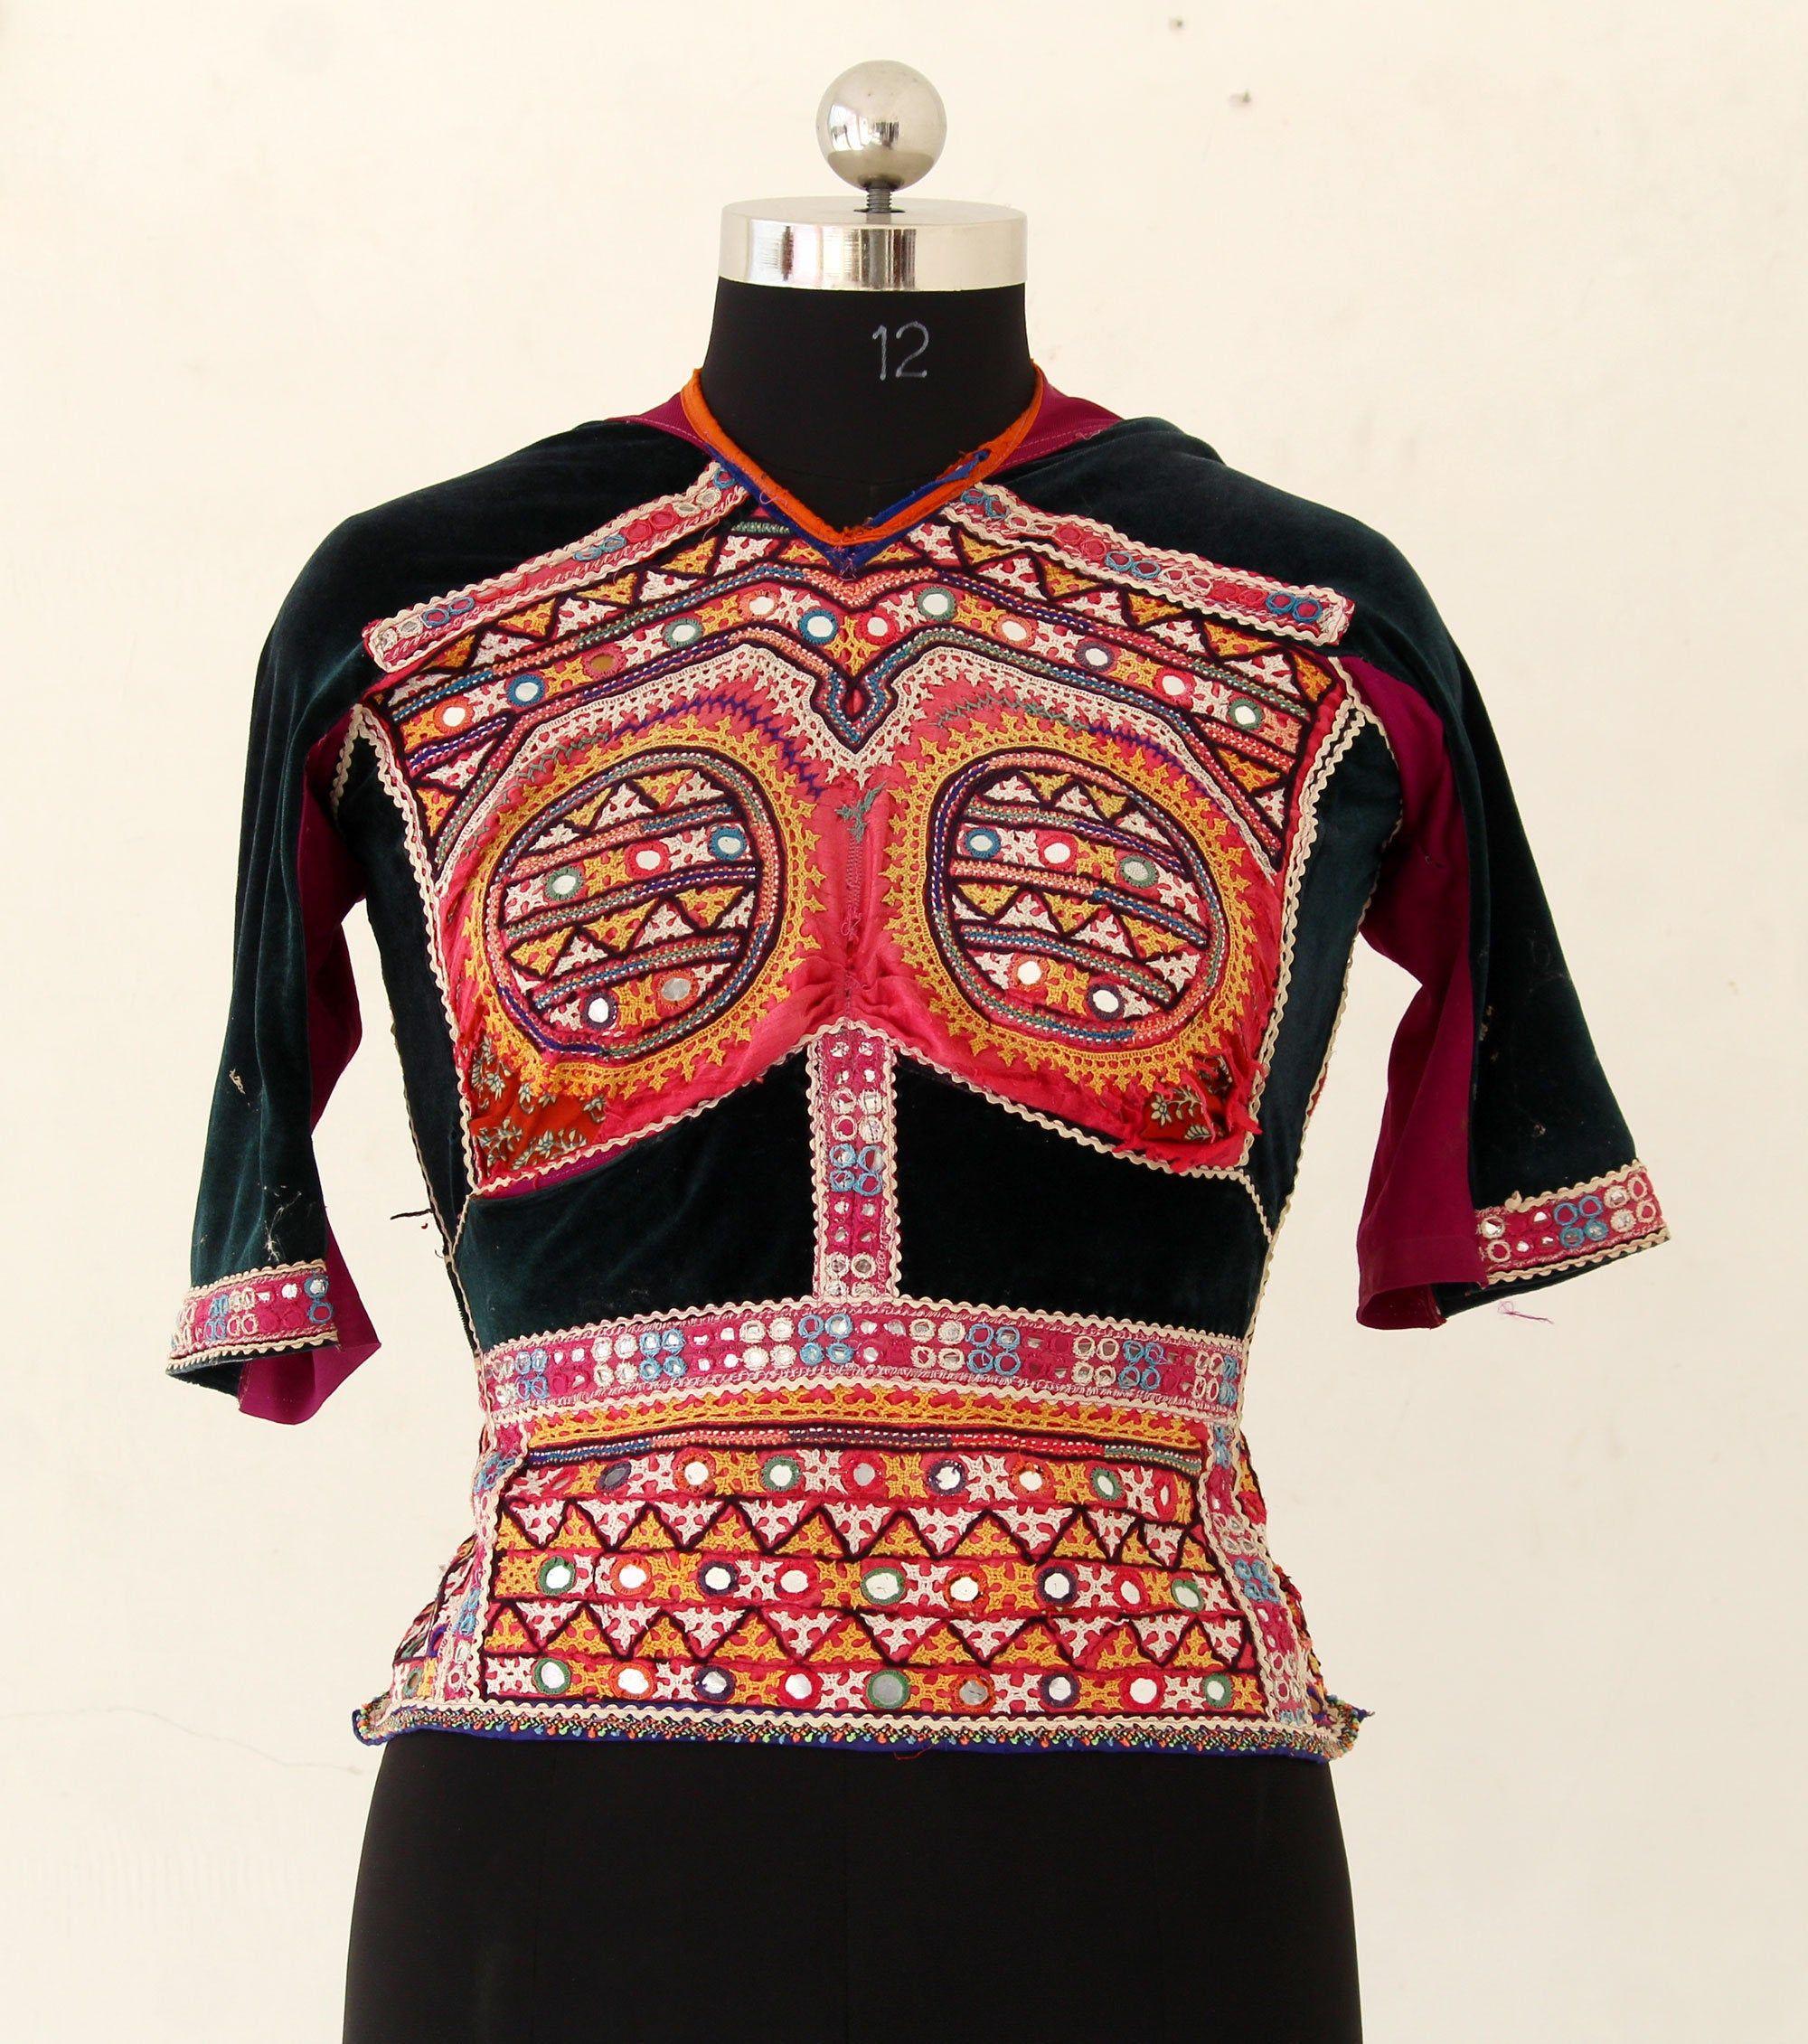 Indian Kutchi Work Vintage Choli Blouse Indian Hand Embroidred Women/'s Short Top Tribal Hippie Gypsy Mirror Work Banjara Belly Bance Choli